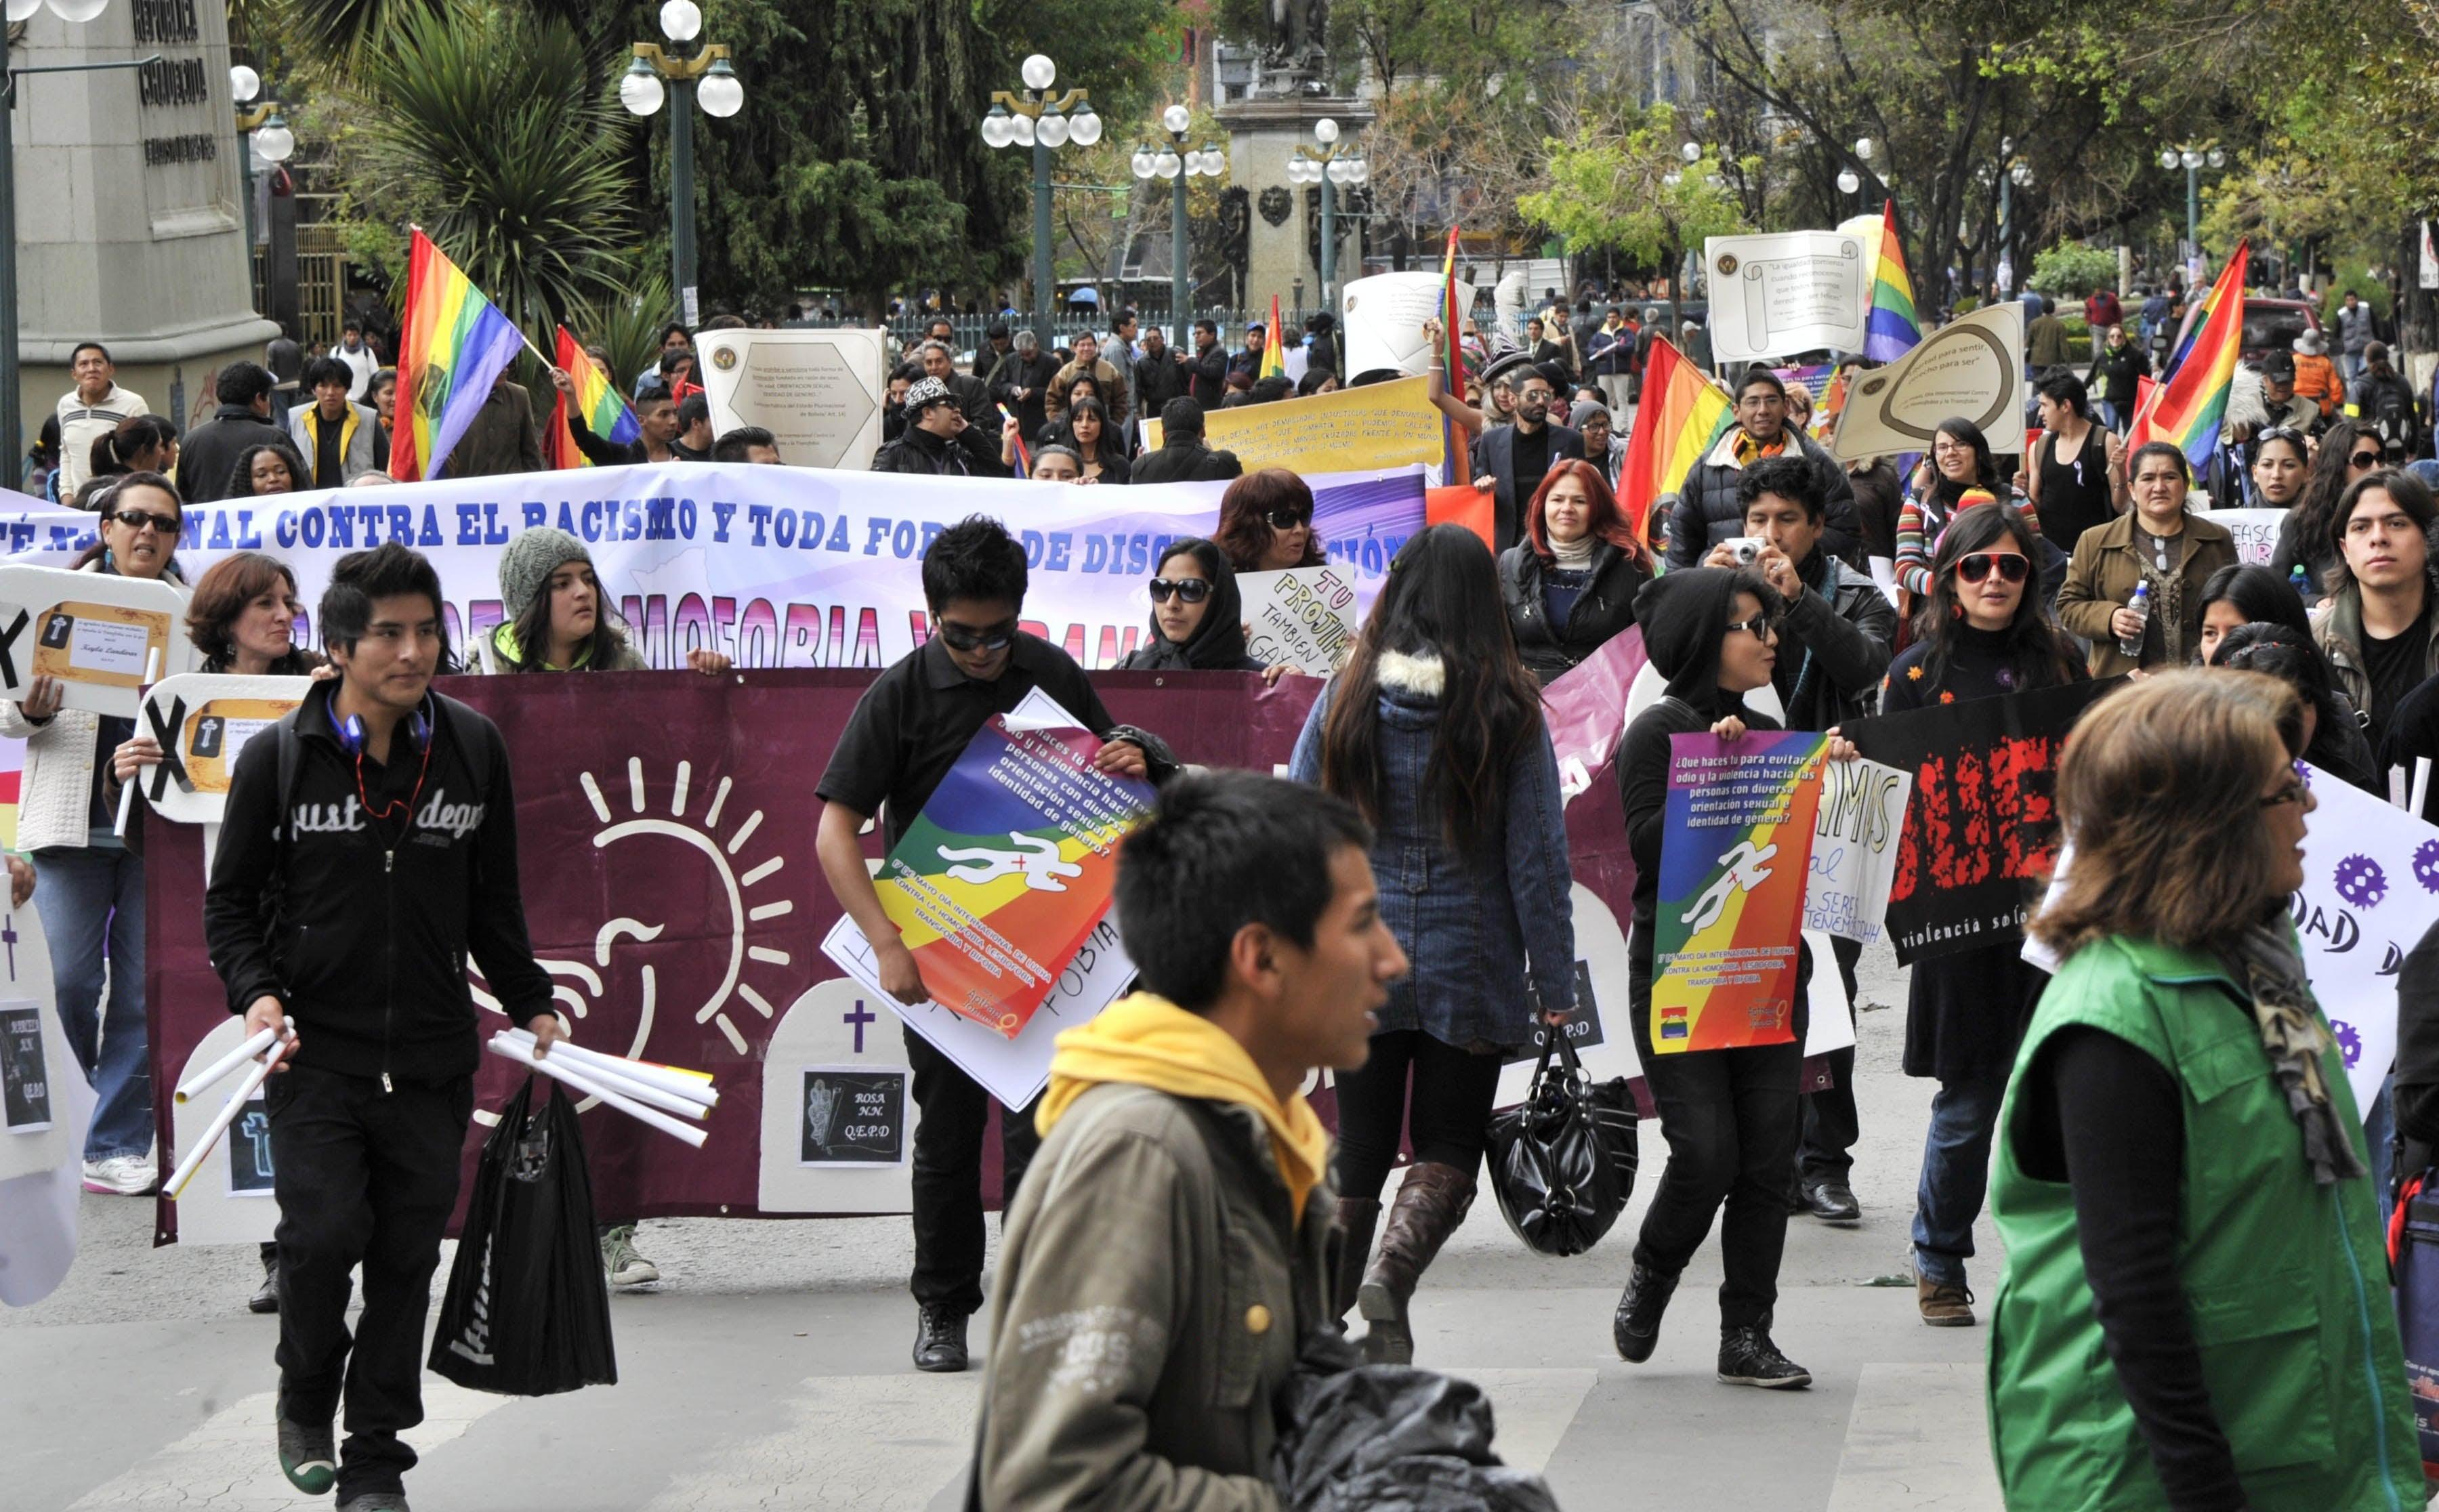 www.hrw.org: Bolivia: Civil Registries Should Recognize Same-Sex Unions